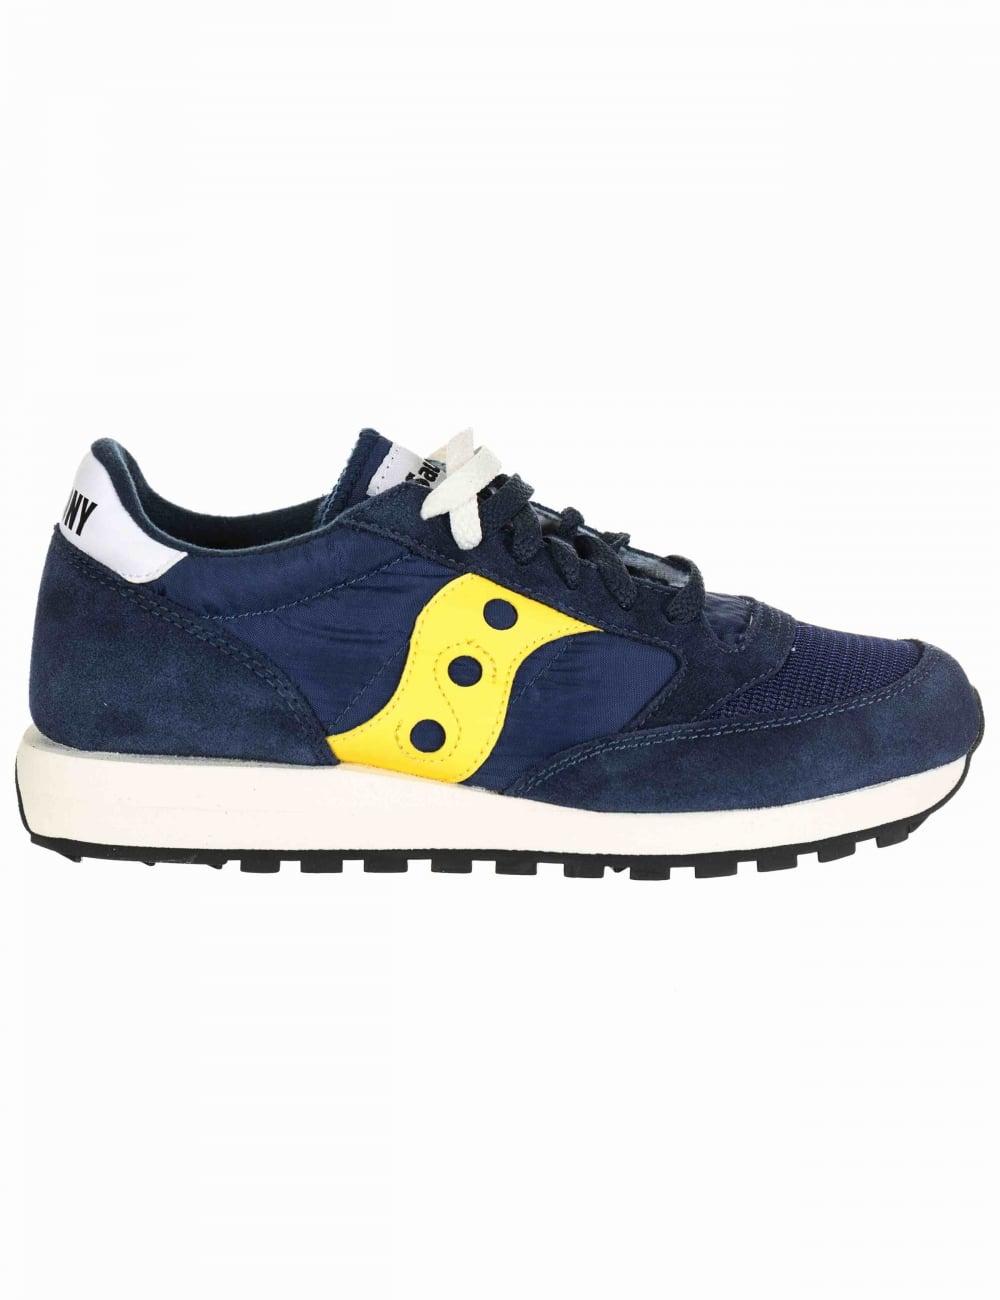 online store 94ceb 4c369 Jazz Original Vintage Shoes - Vintage Blue/Yellow